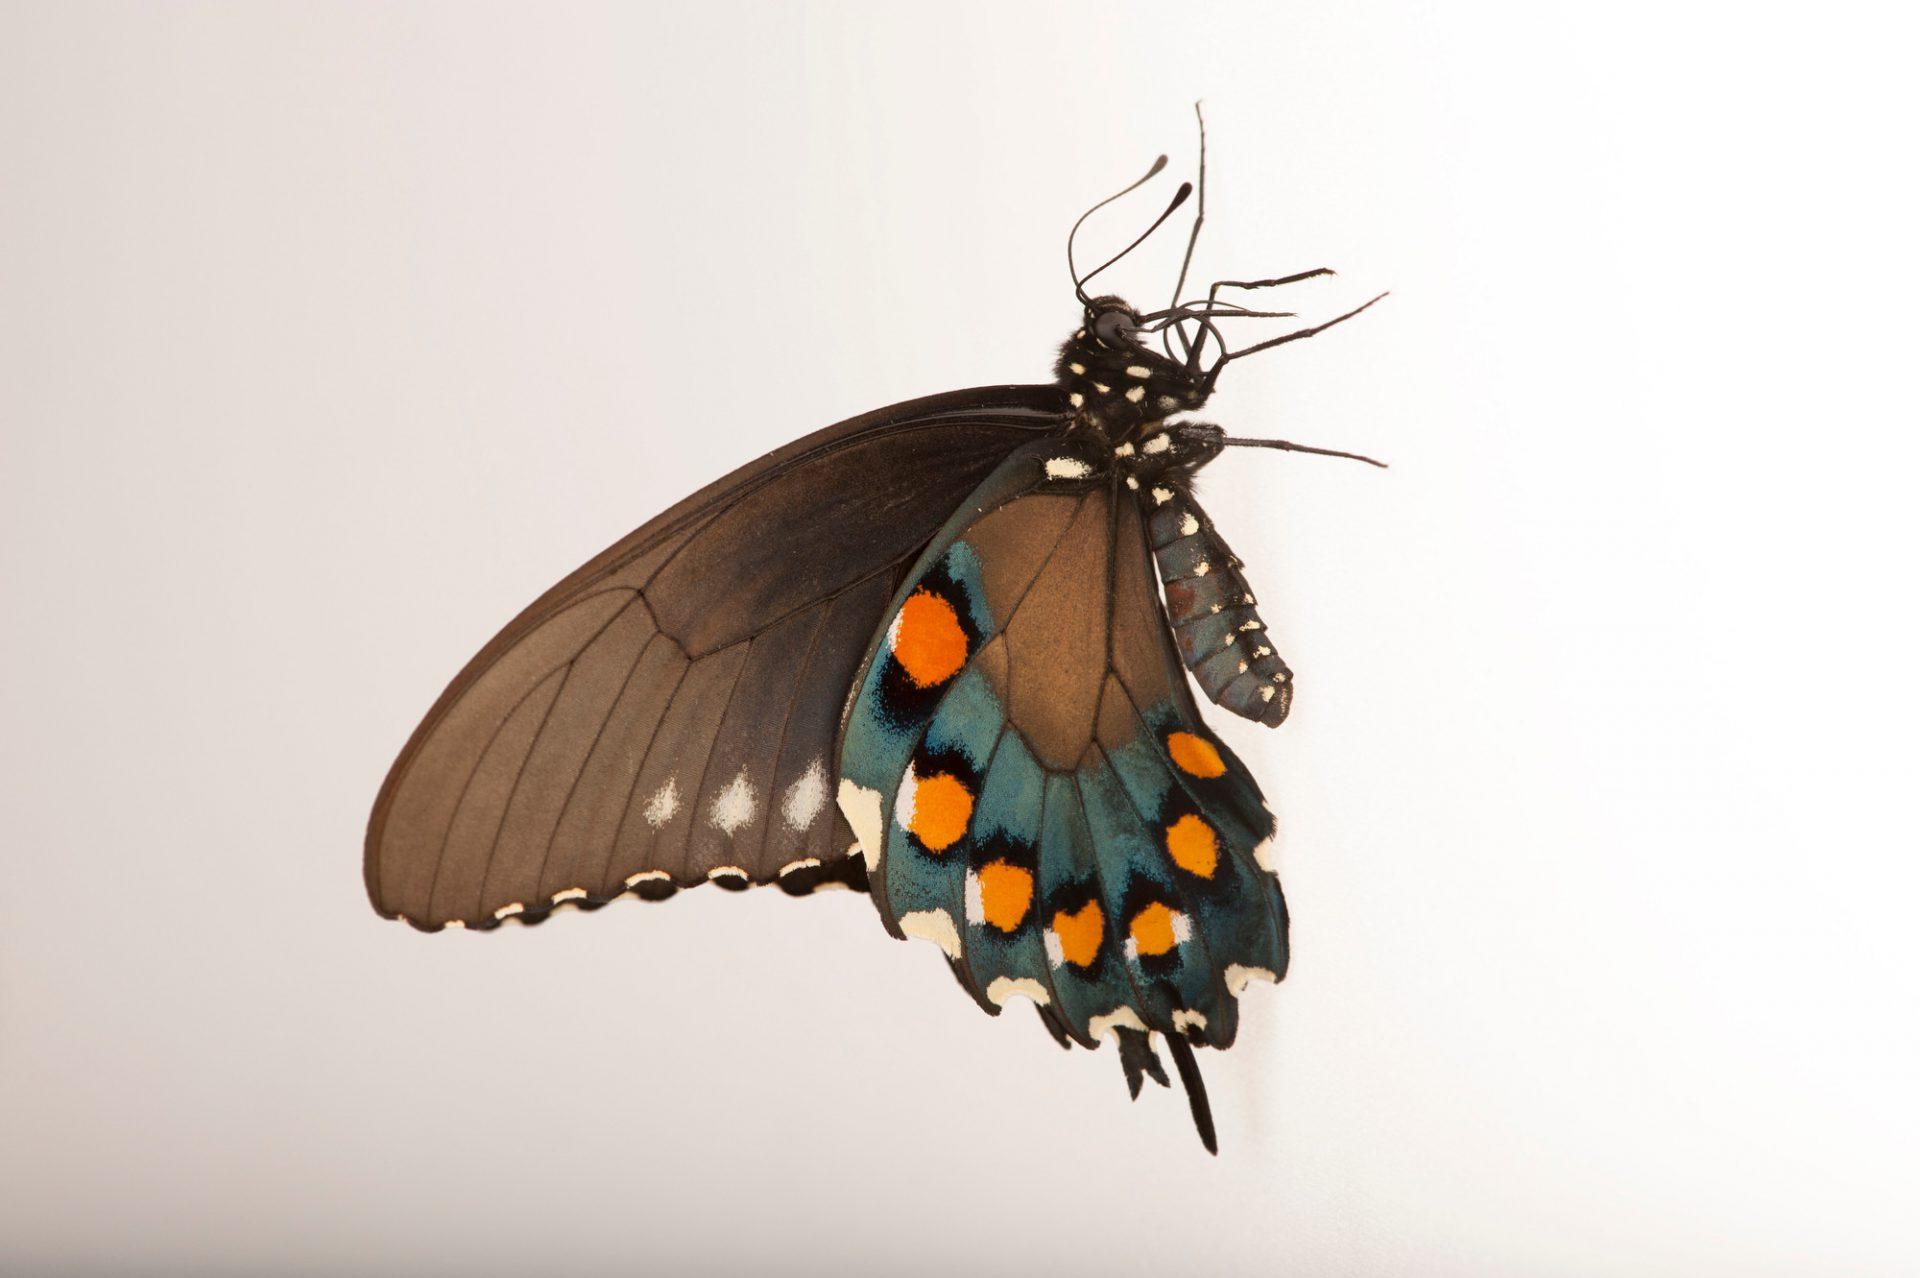 Pipevine swallowtail (Battus philenor) a native to Nebraska, at the Lincoln Children's Zoo.